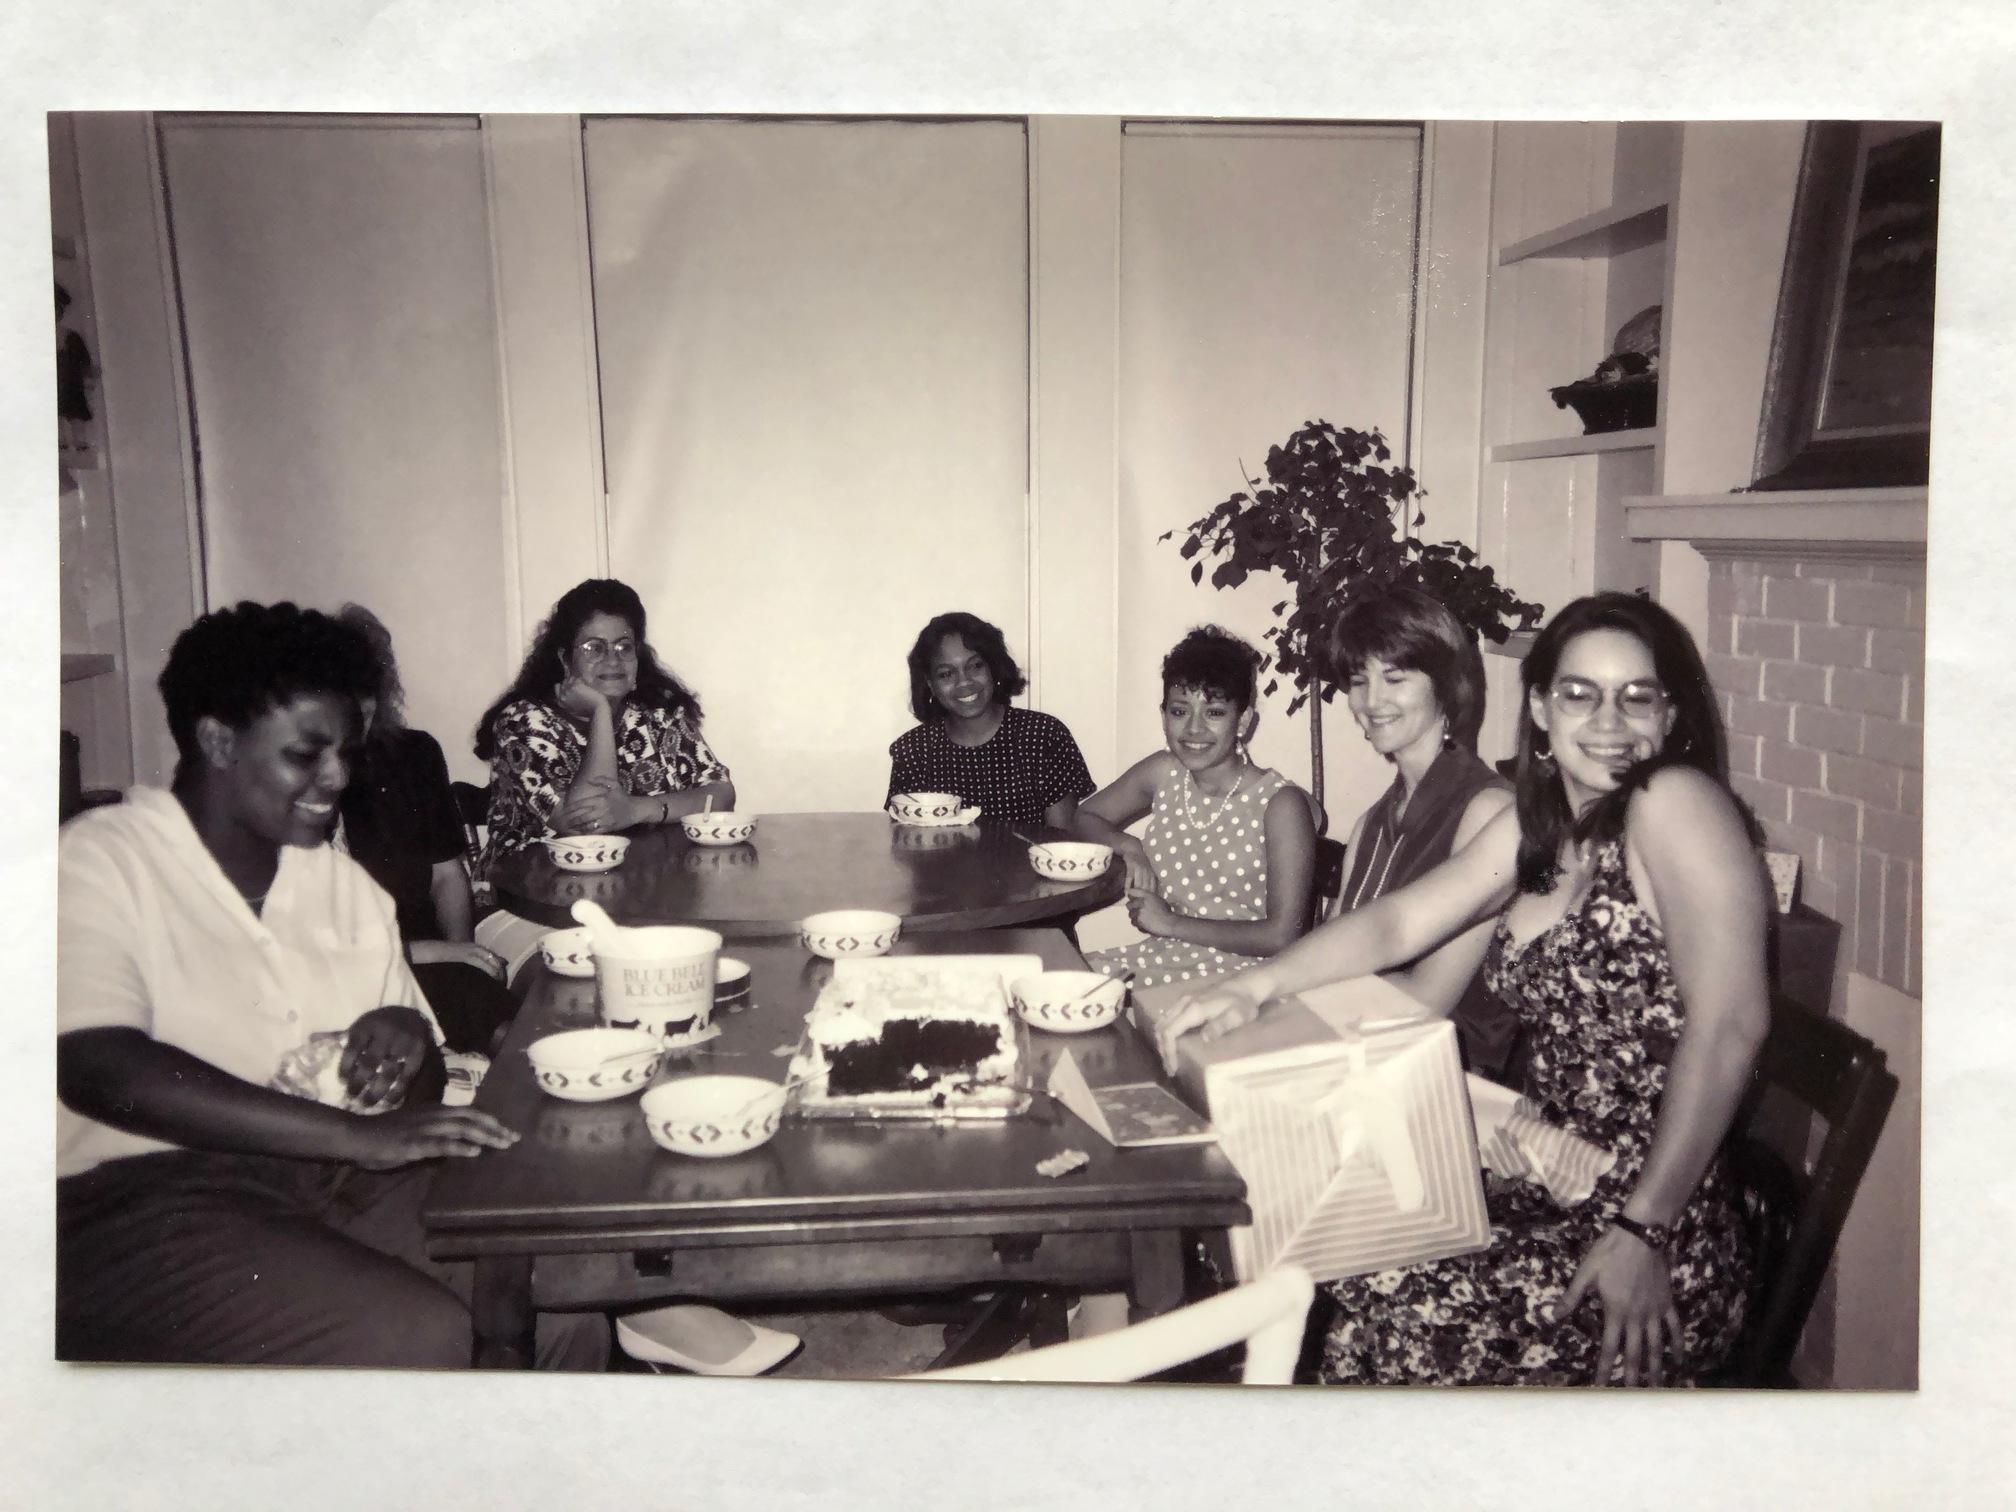 Girls_around_table_date_unknown_resized.jpg